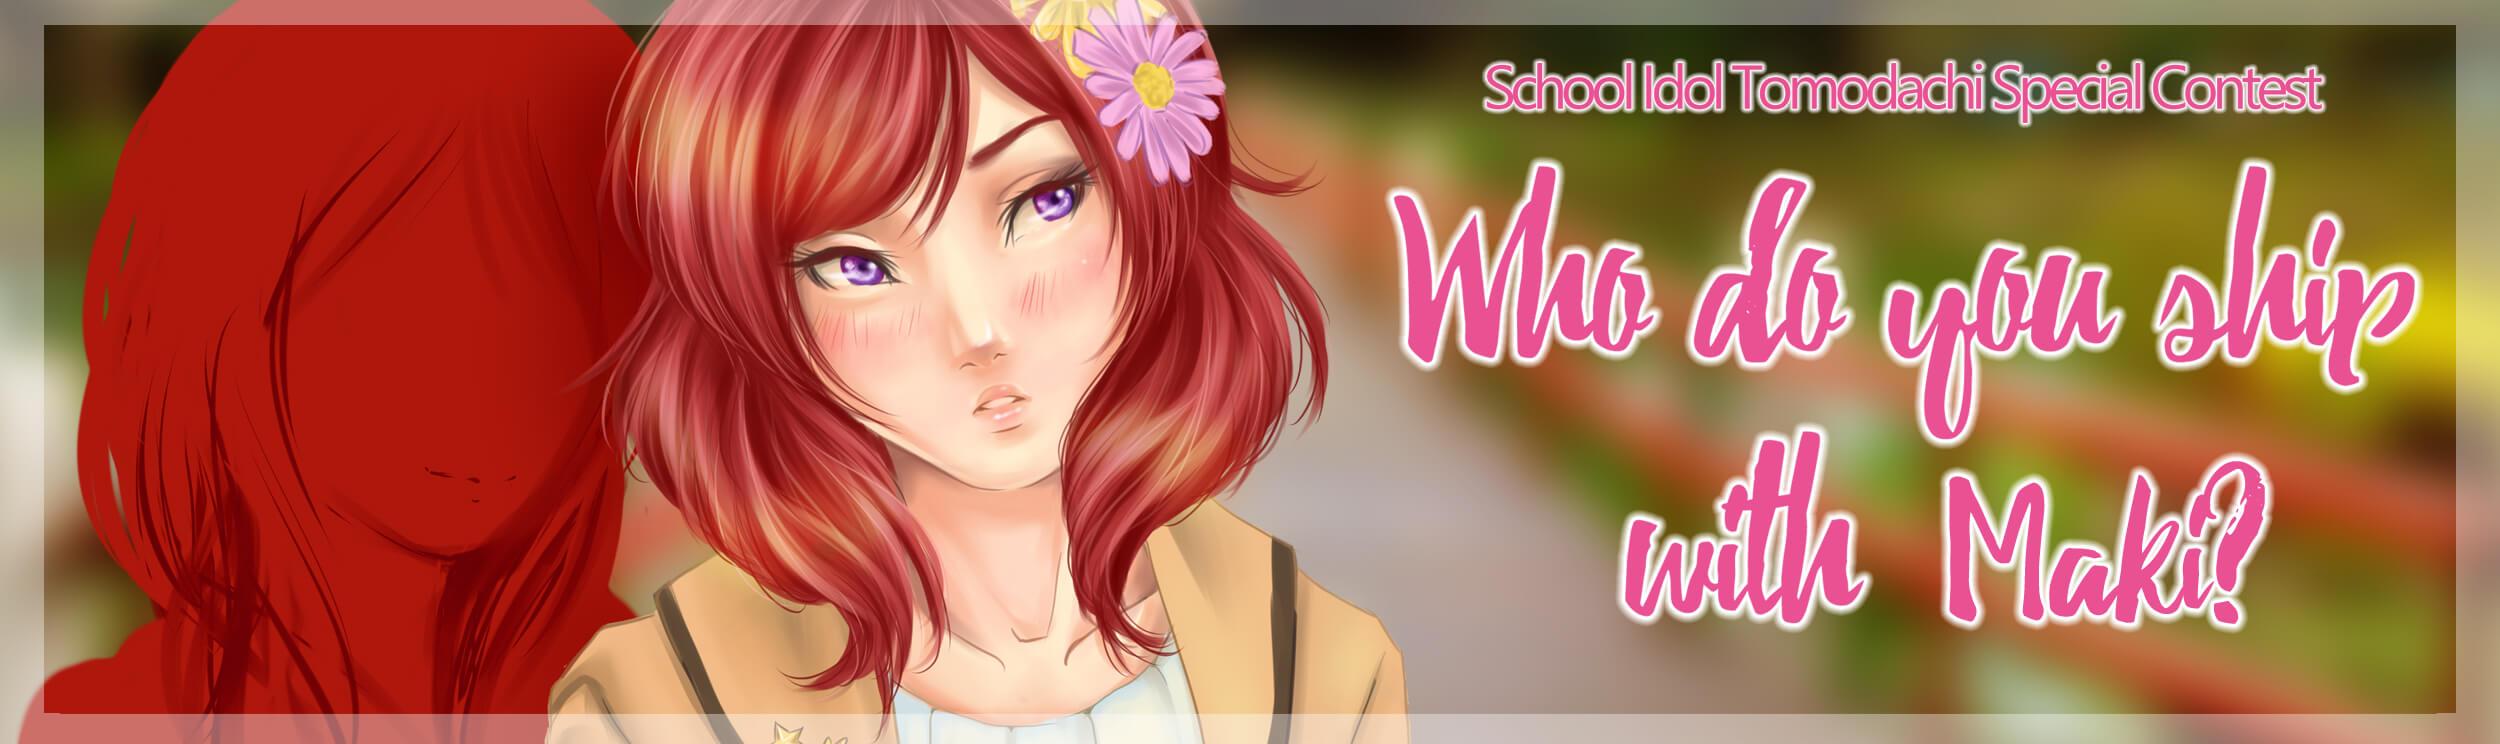 Who do you ship with Maki?